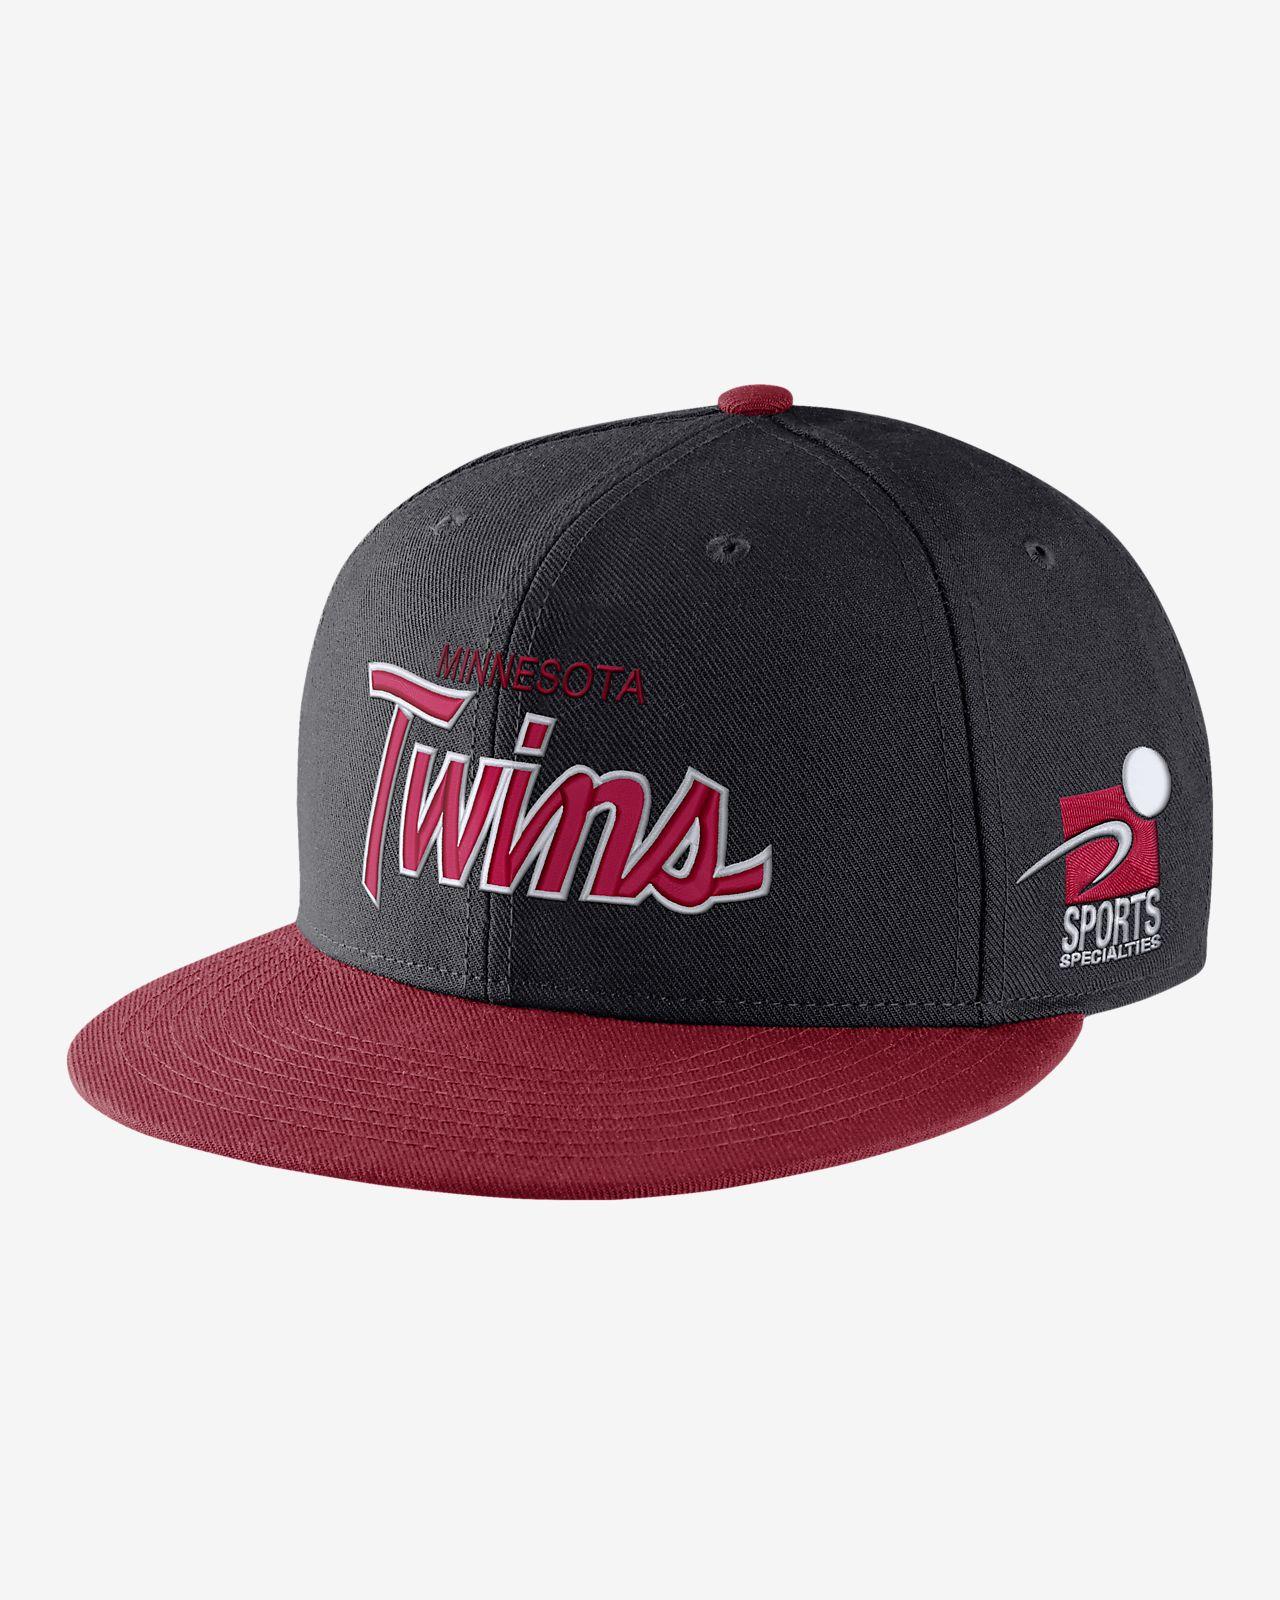 Nike Pro Sport Specialties (MLB Twins) Adjustable Hat